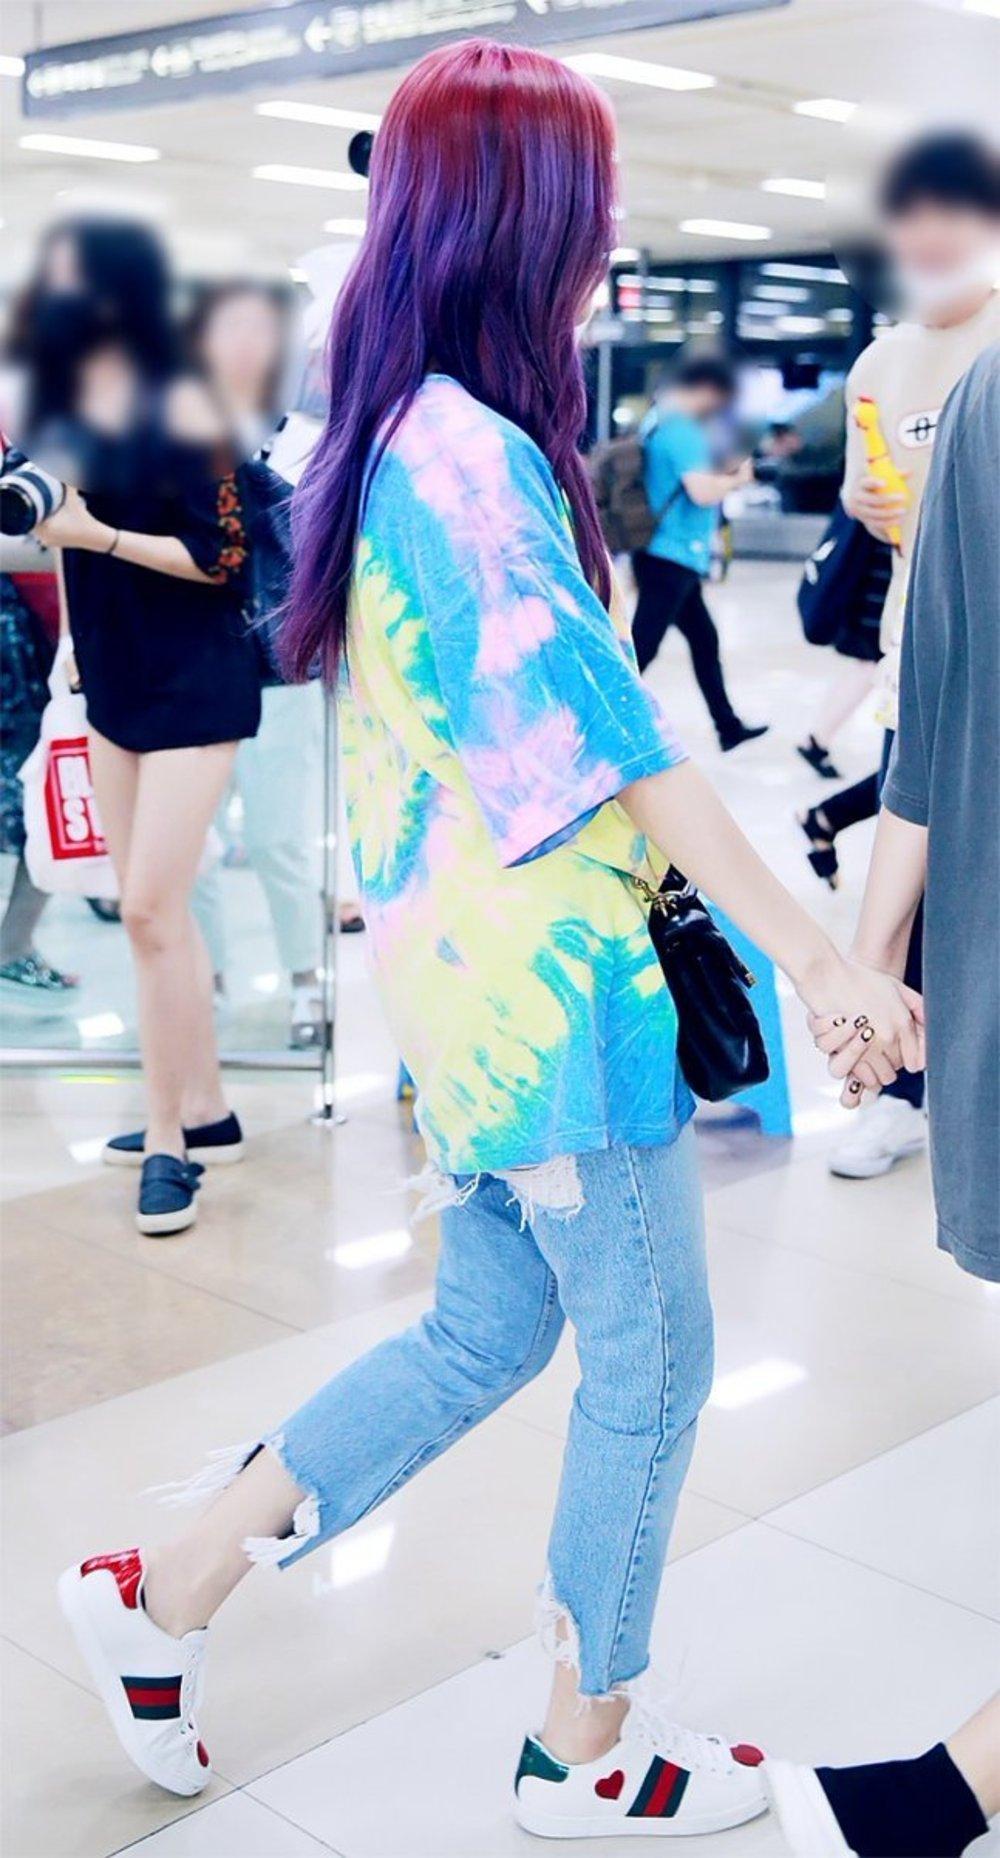 Blackpink Jisoo S New Hairstyle Is Freakin Awesome Koreaboo